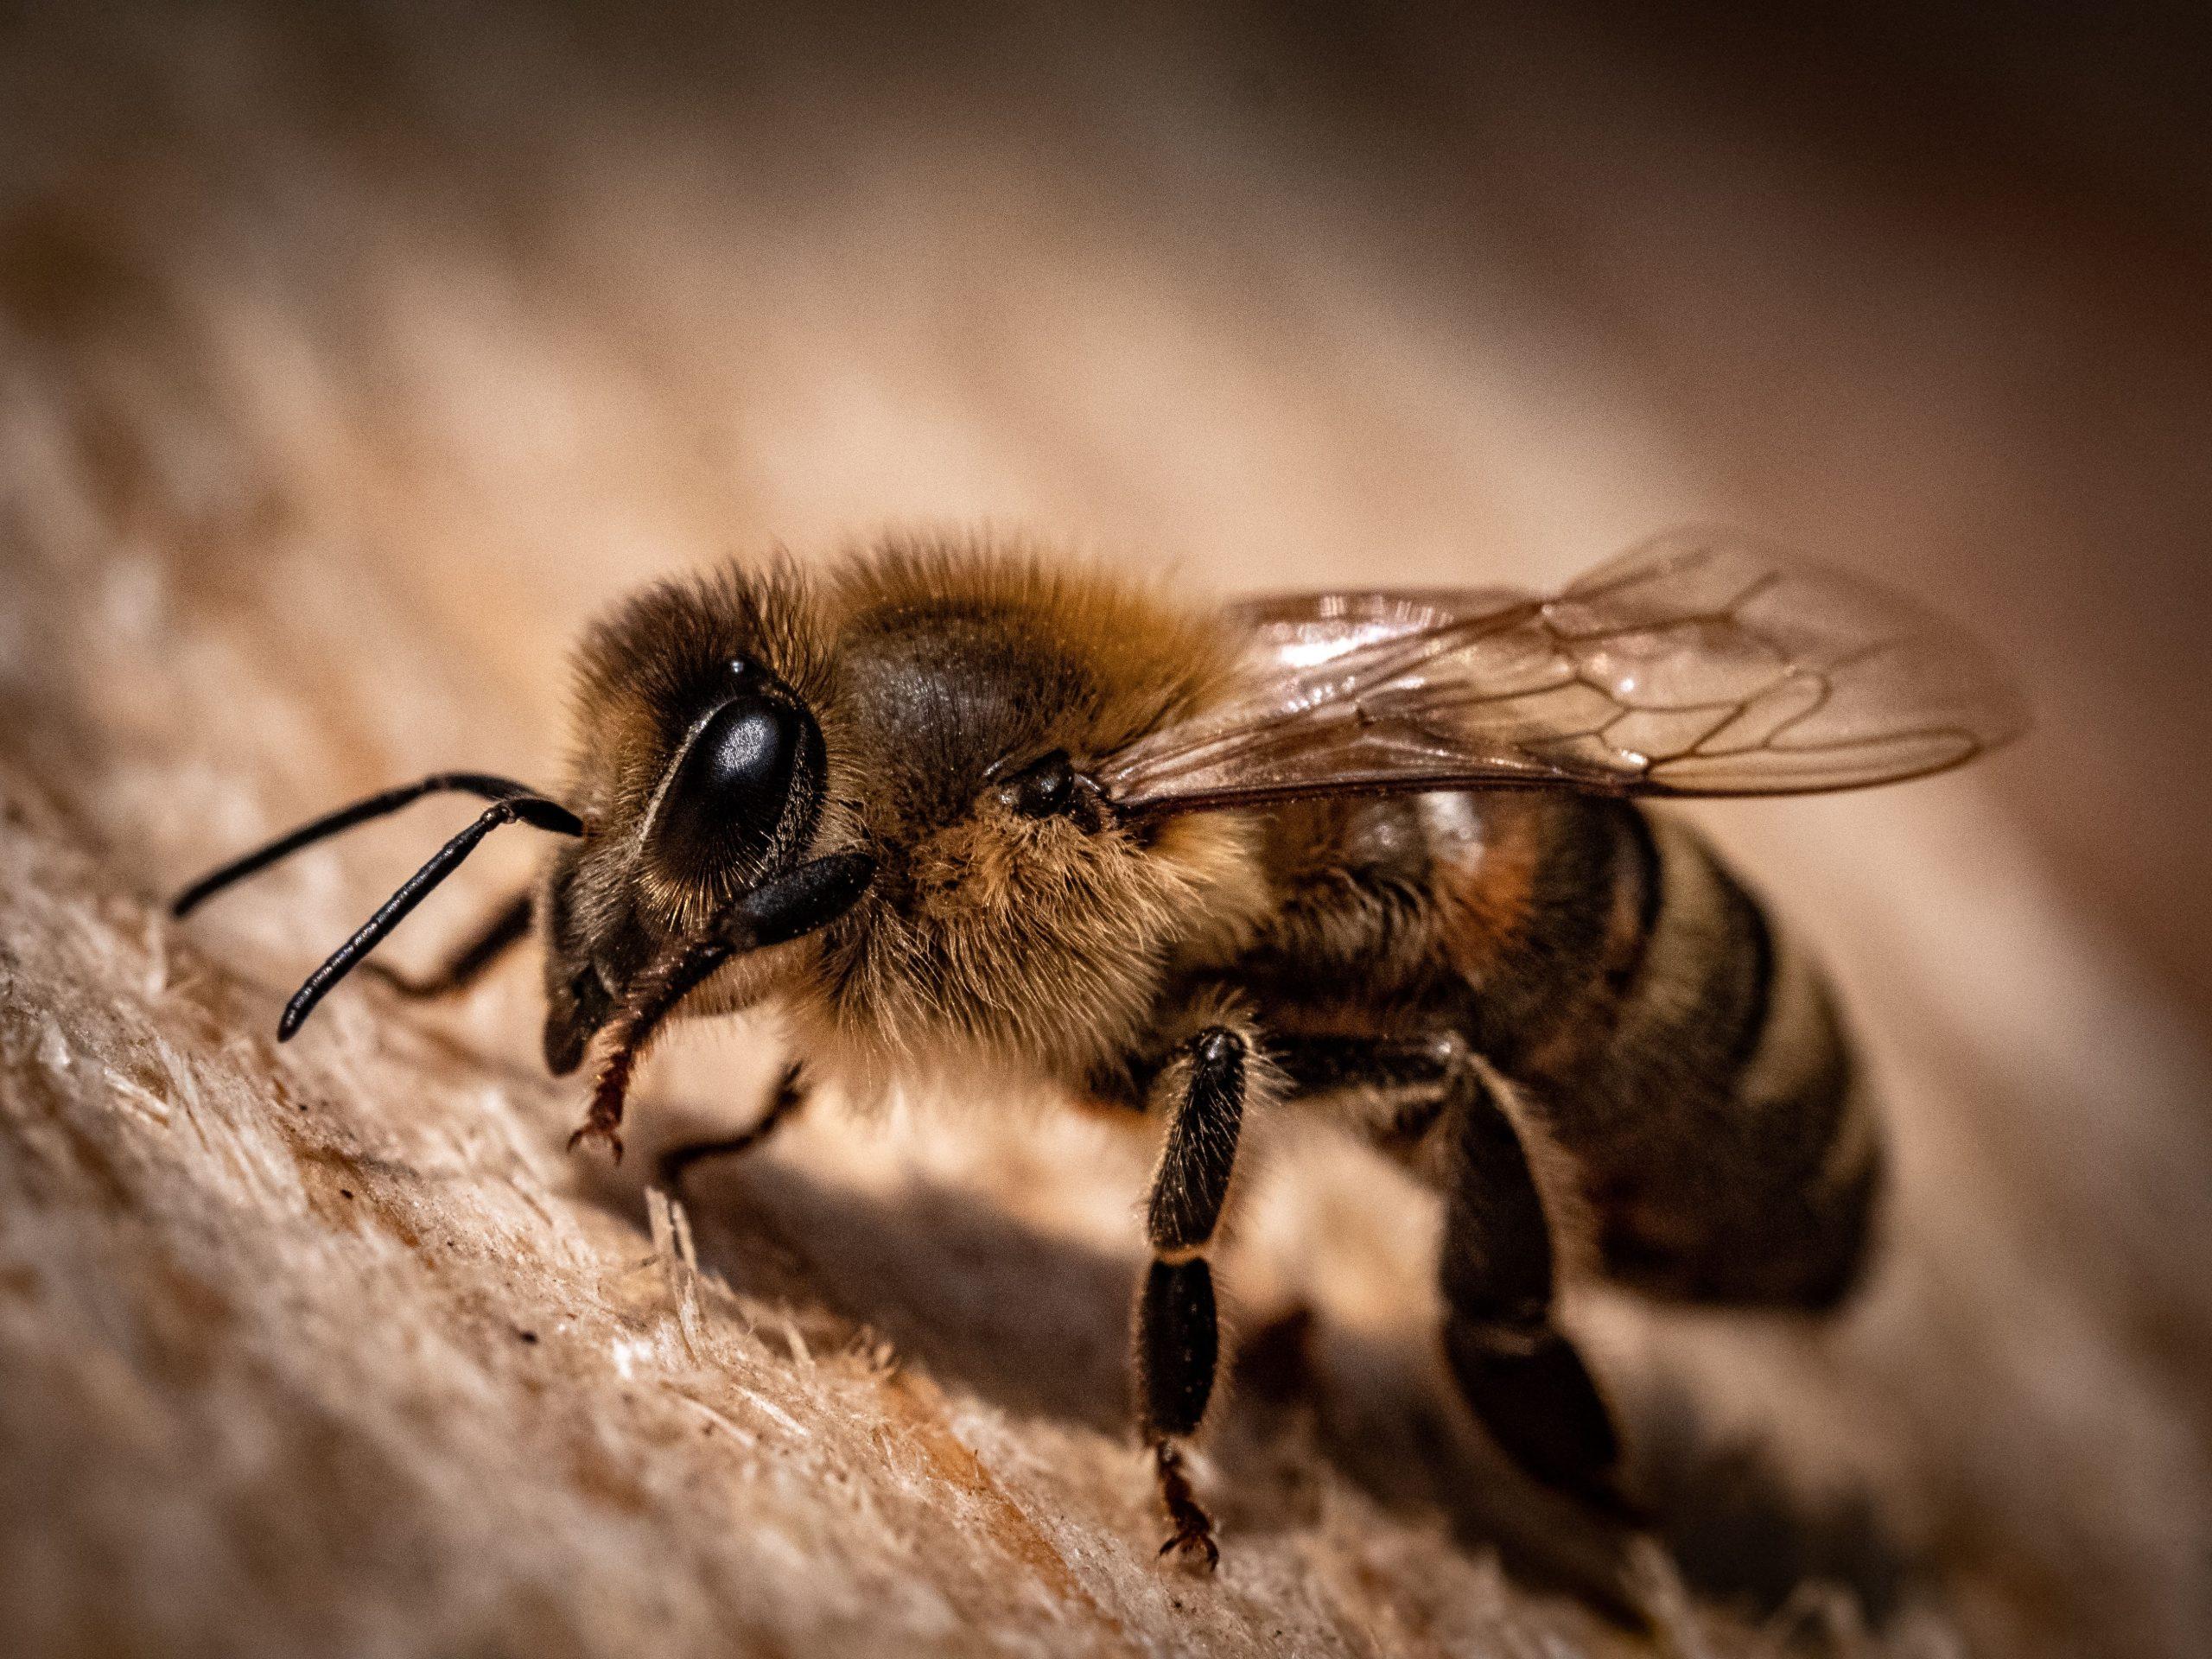 harige bijen